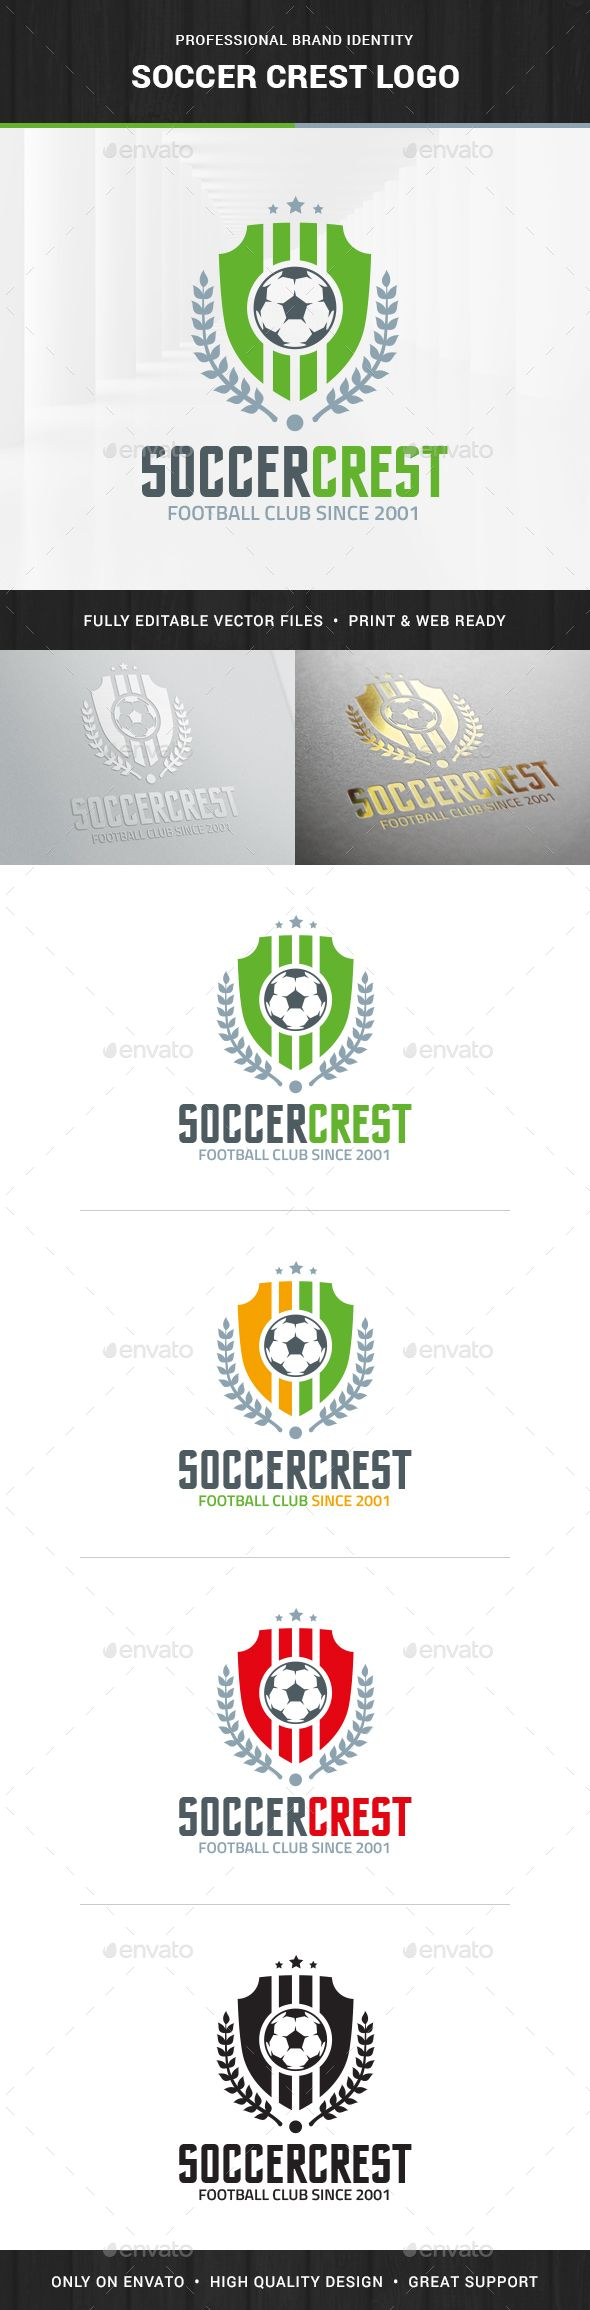 Soccer Crest Logo Template — Transparent PNG #royal #laurel wreath • Available here → https://graphicriver.net/item/soccer-crest-logo-template/14464641?ref=pxcr